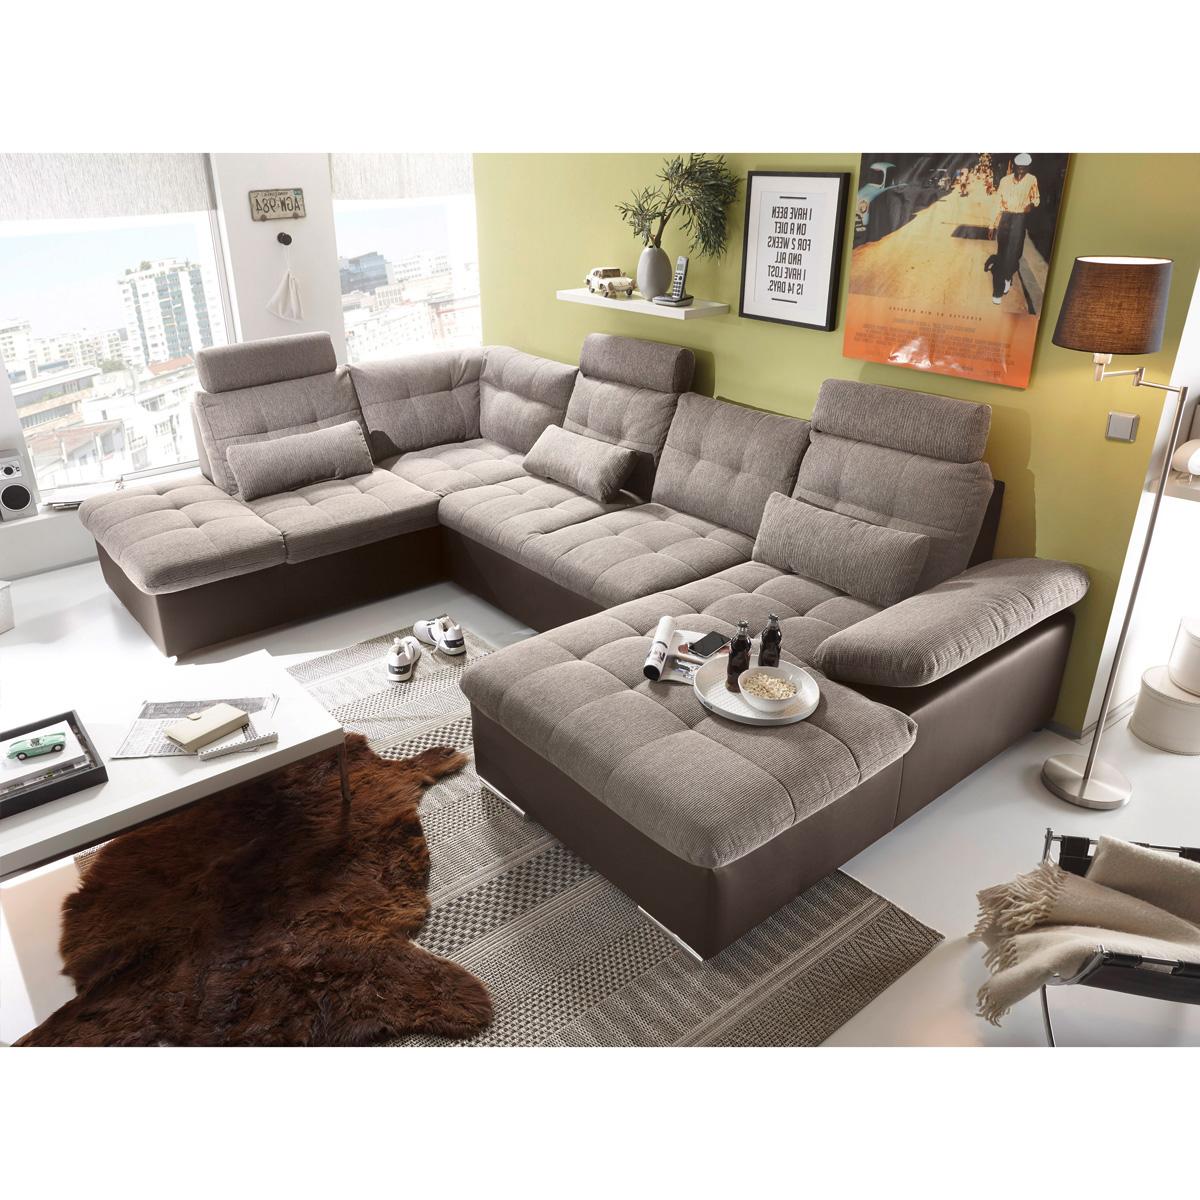 wohnlandschaft jakarta ecksofa braun schwarz grau anthrazit lawa rechts links ebay. Black Bedroom Furniture Sets. Home Design Ideas